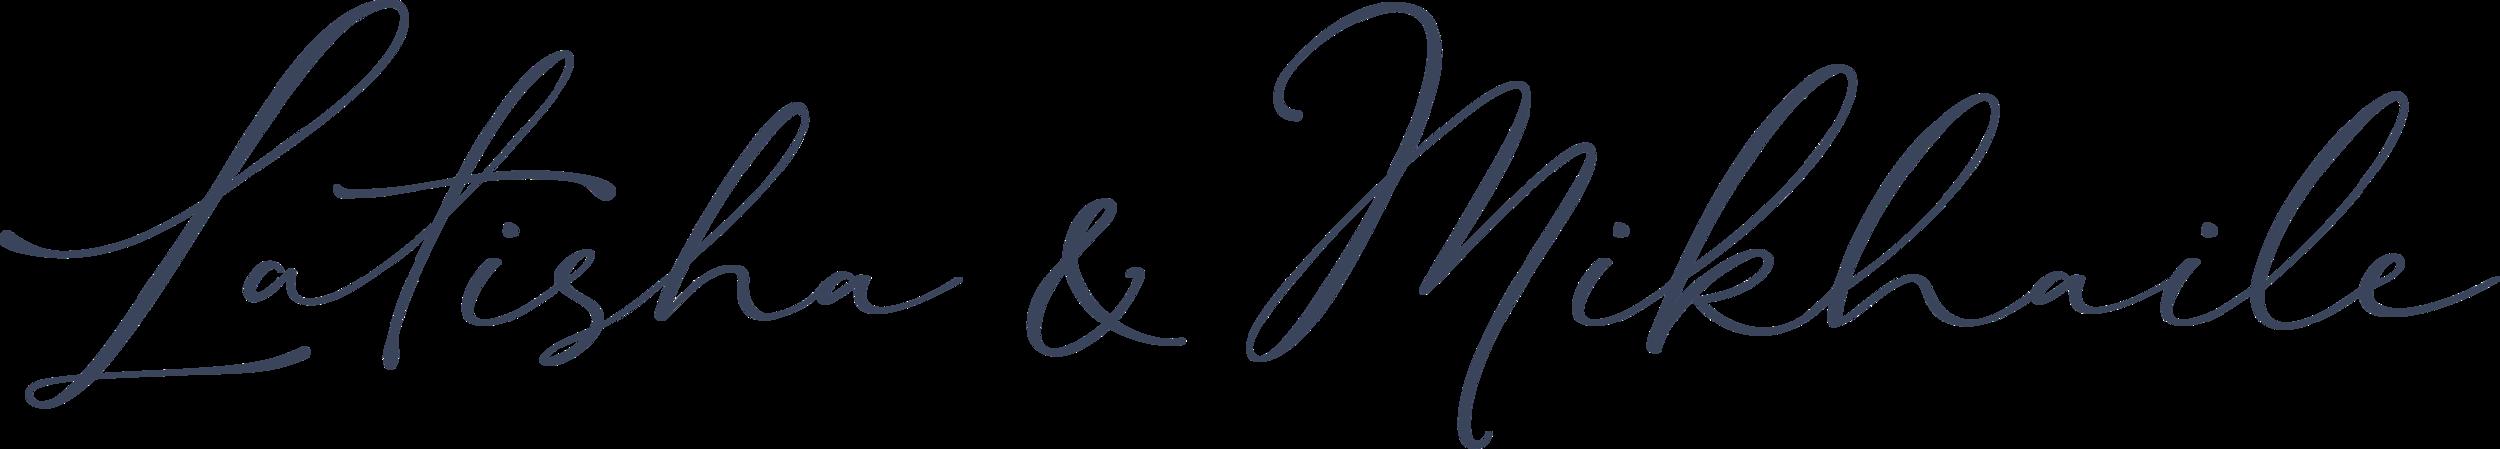 latisha-mikhaile-signature.png